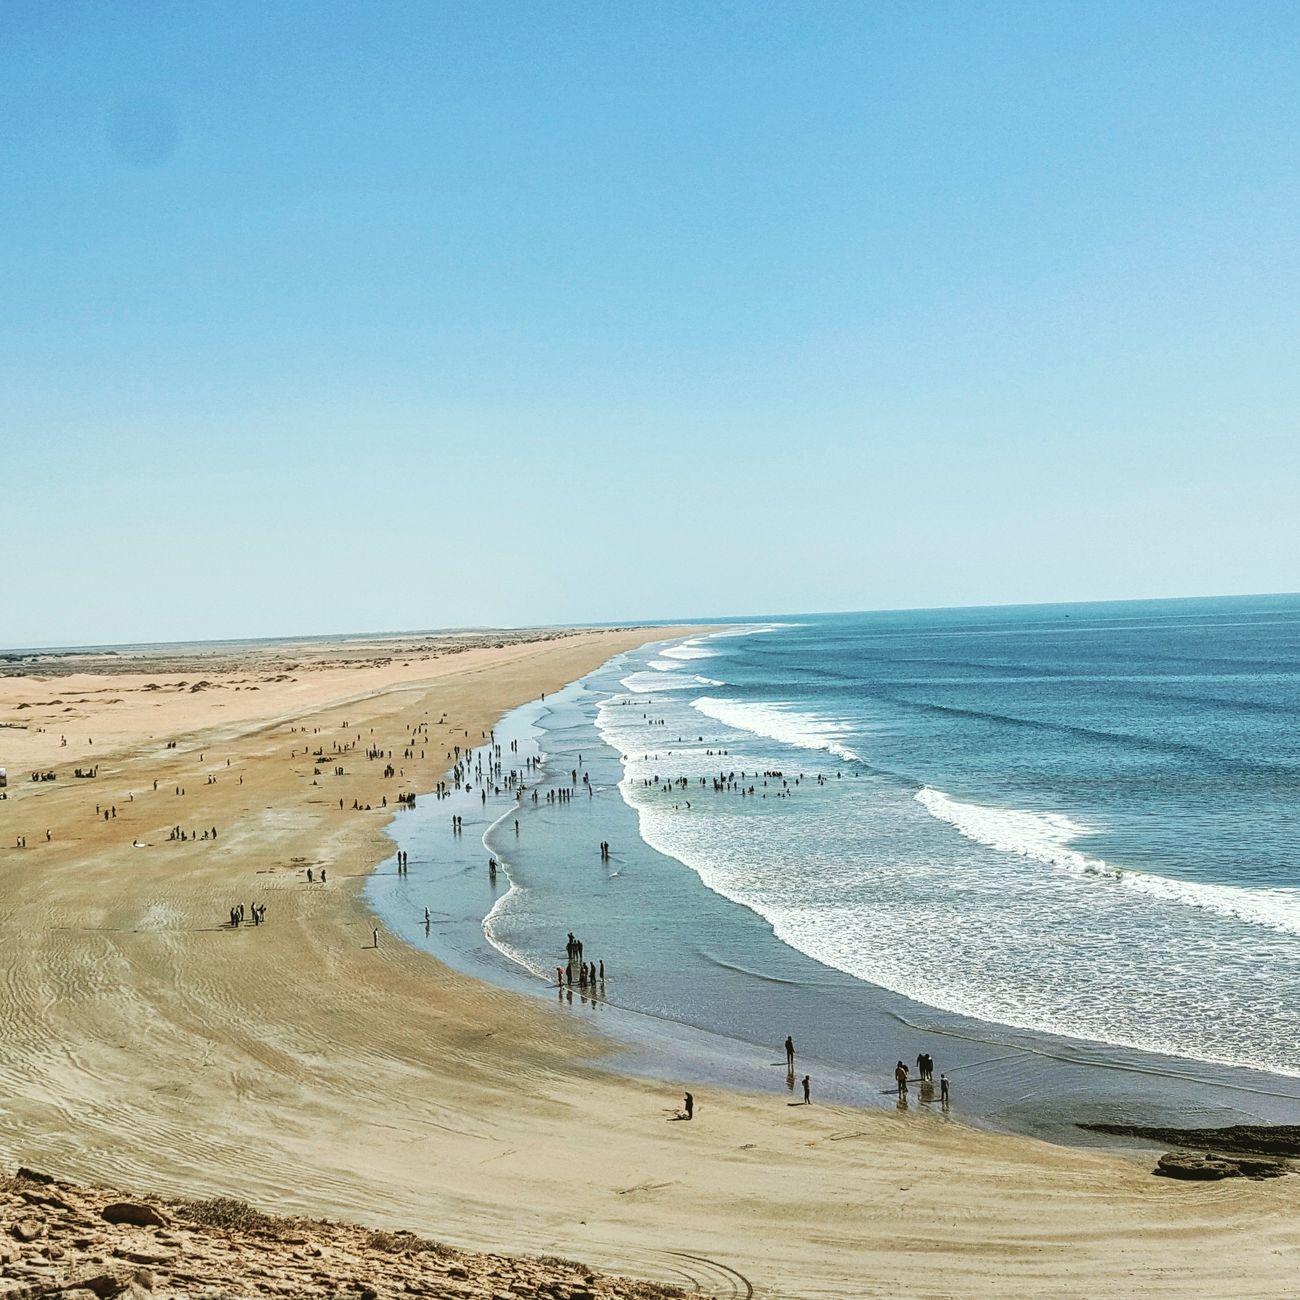 Kundmalirbeach Hingolnationalpark Travel Photography Mobilephotography Balochistan Adventure Scenery Shots Pakistan Landscape_photography